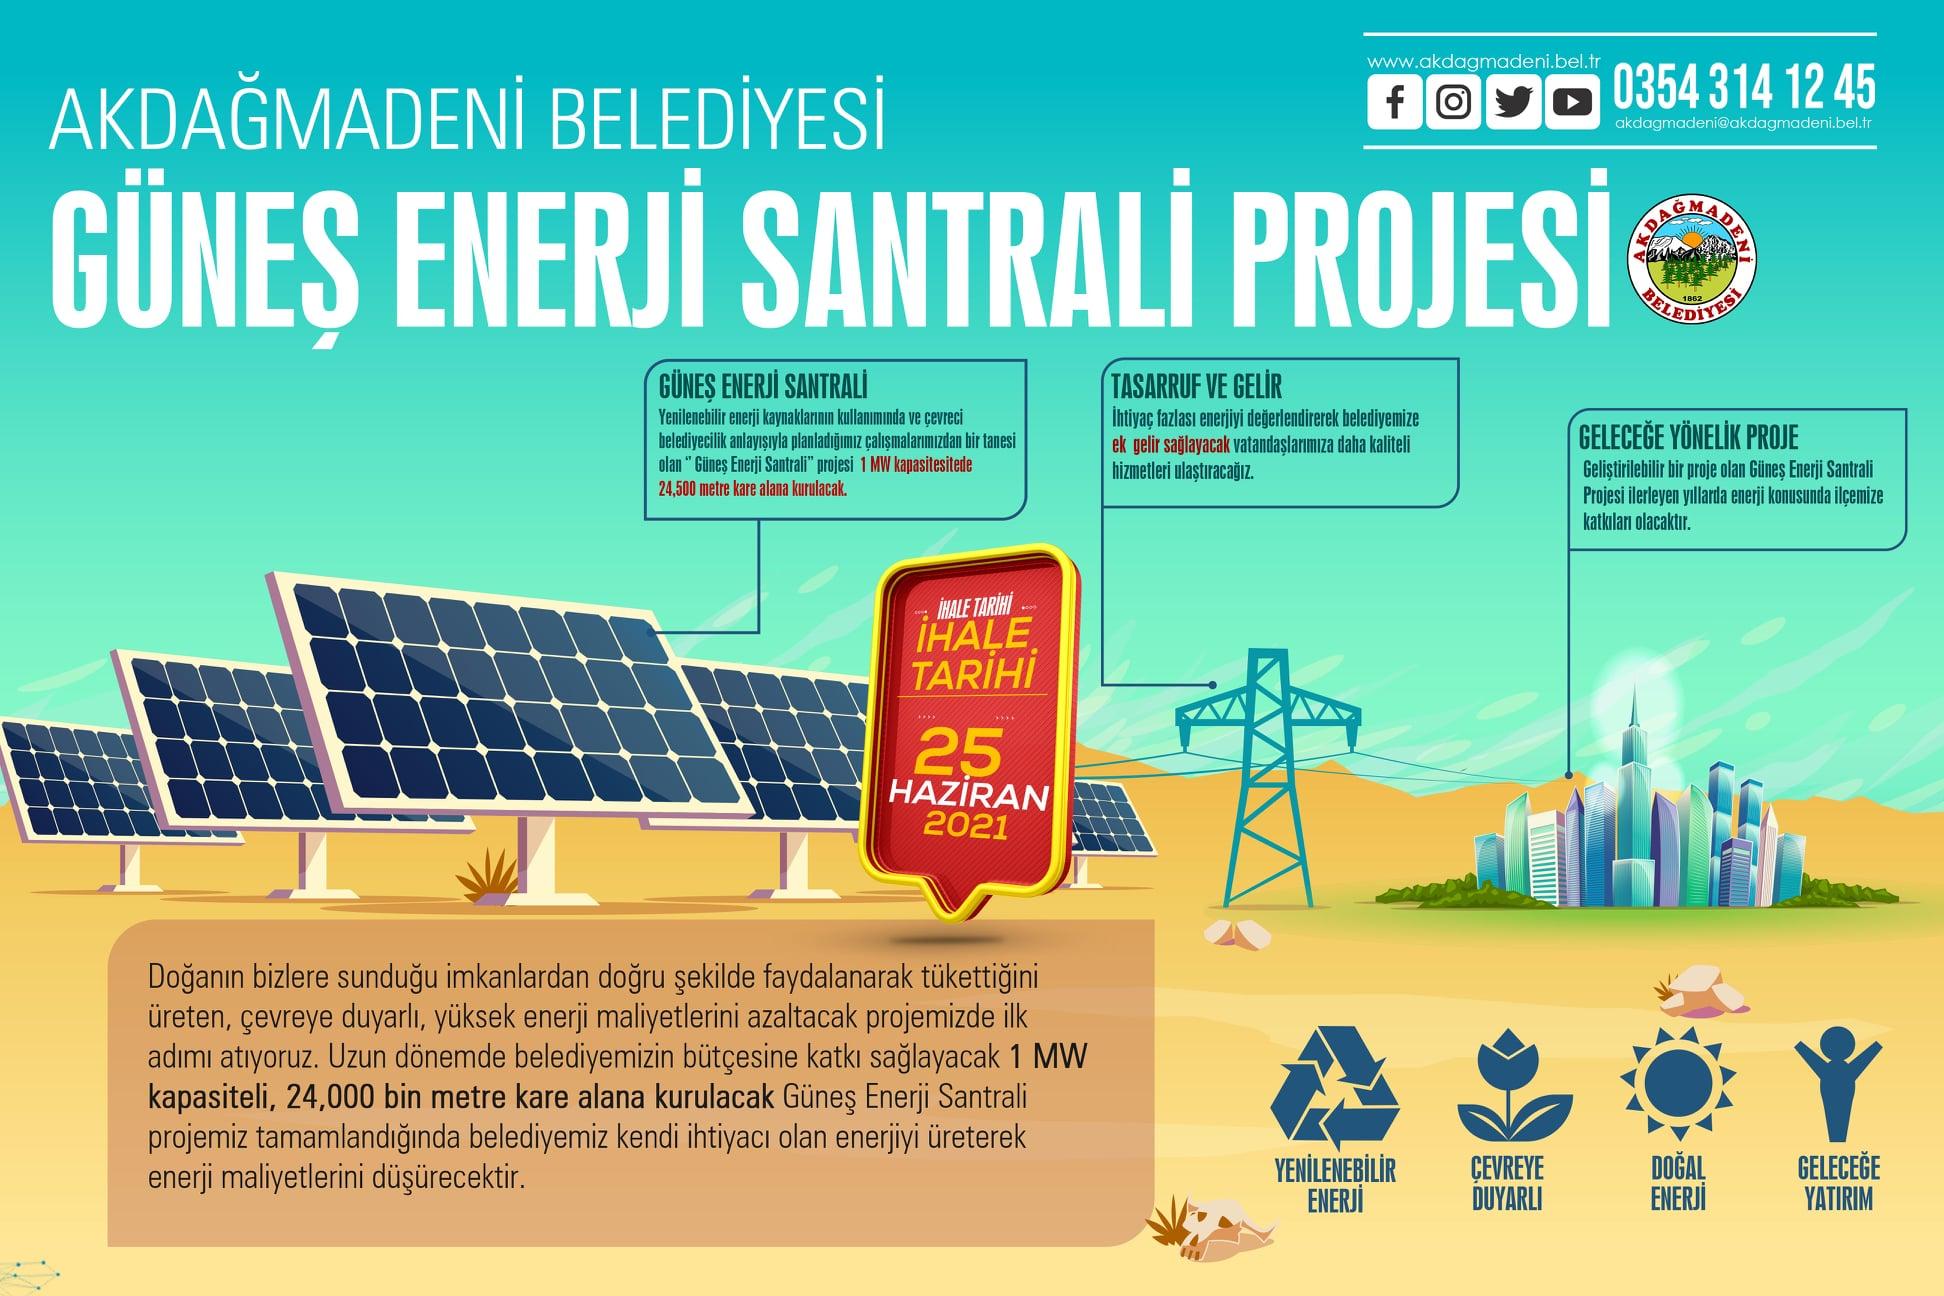 akdag-enerji-santrali-1.jpg